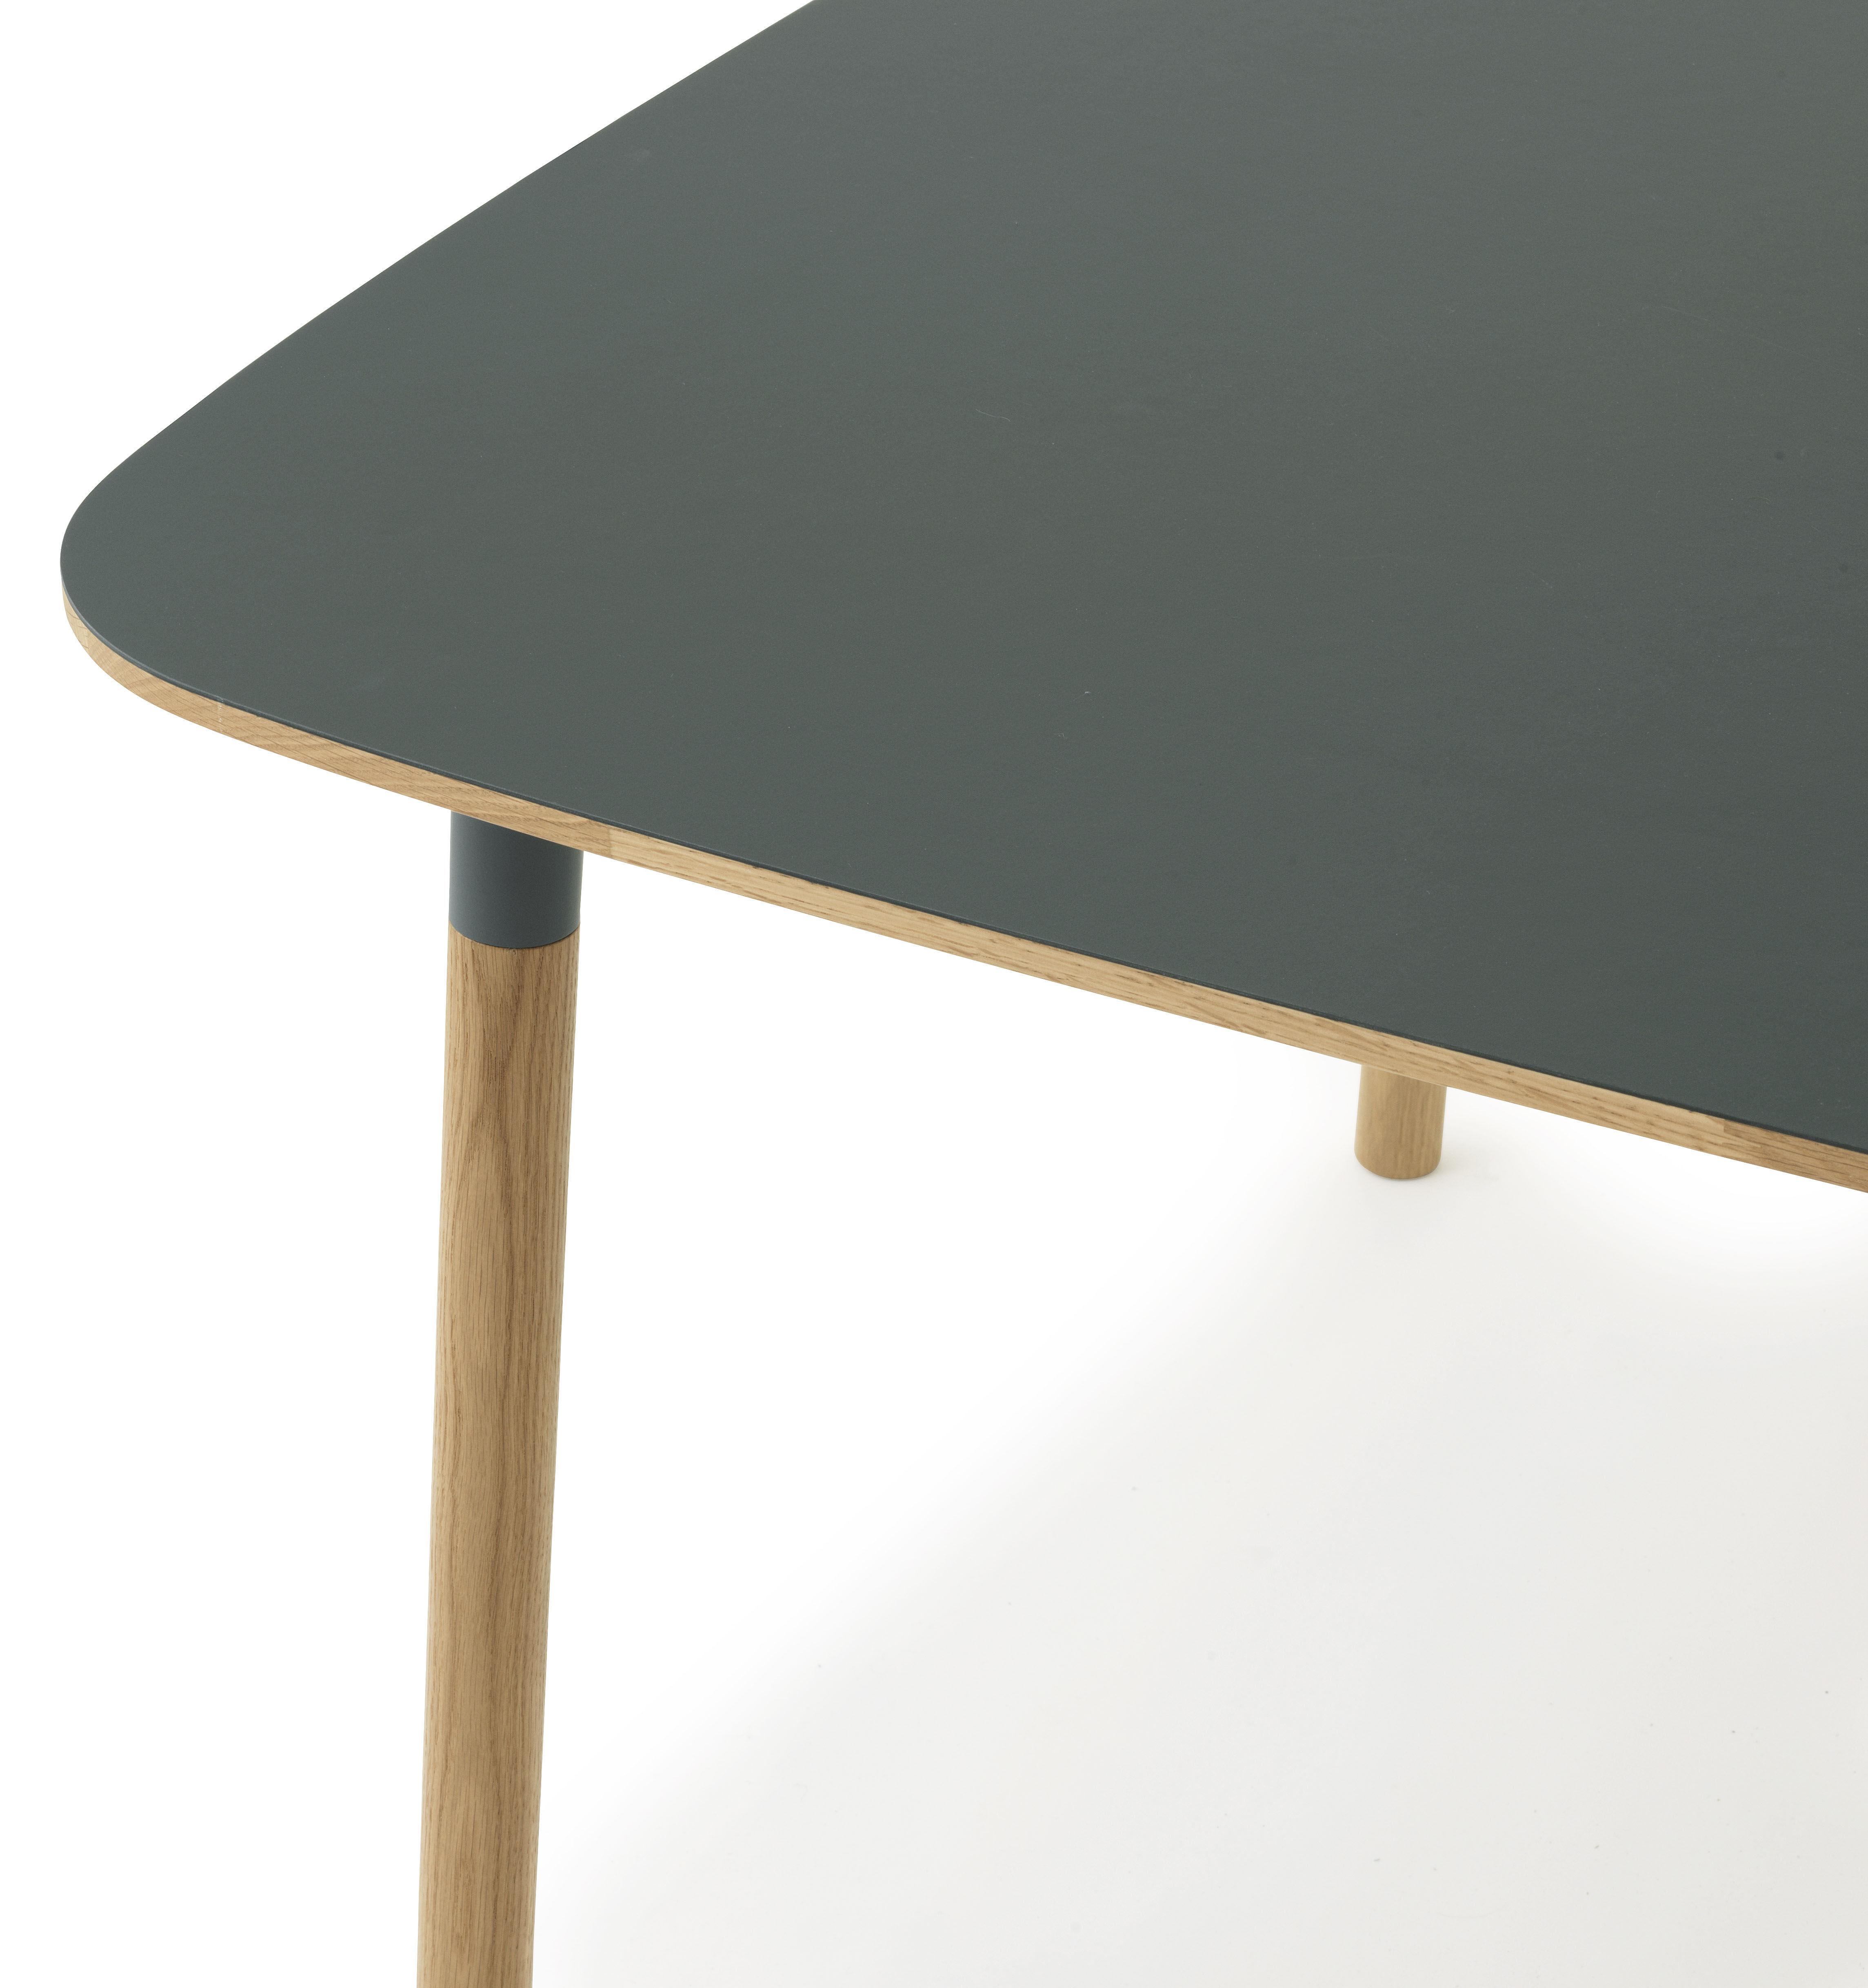 form 120 x 120 cm normann copenhagen tisch. Black Bedroom Furniture Sets. Home Design Ideas